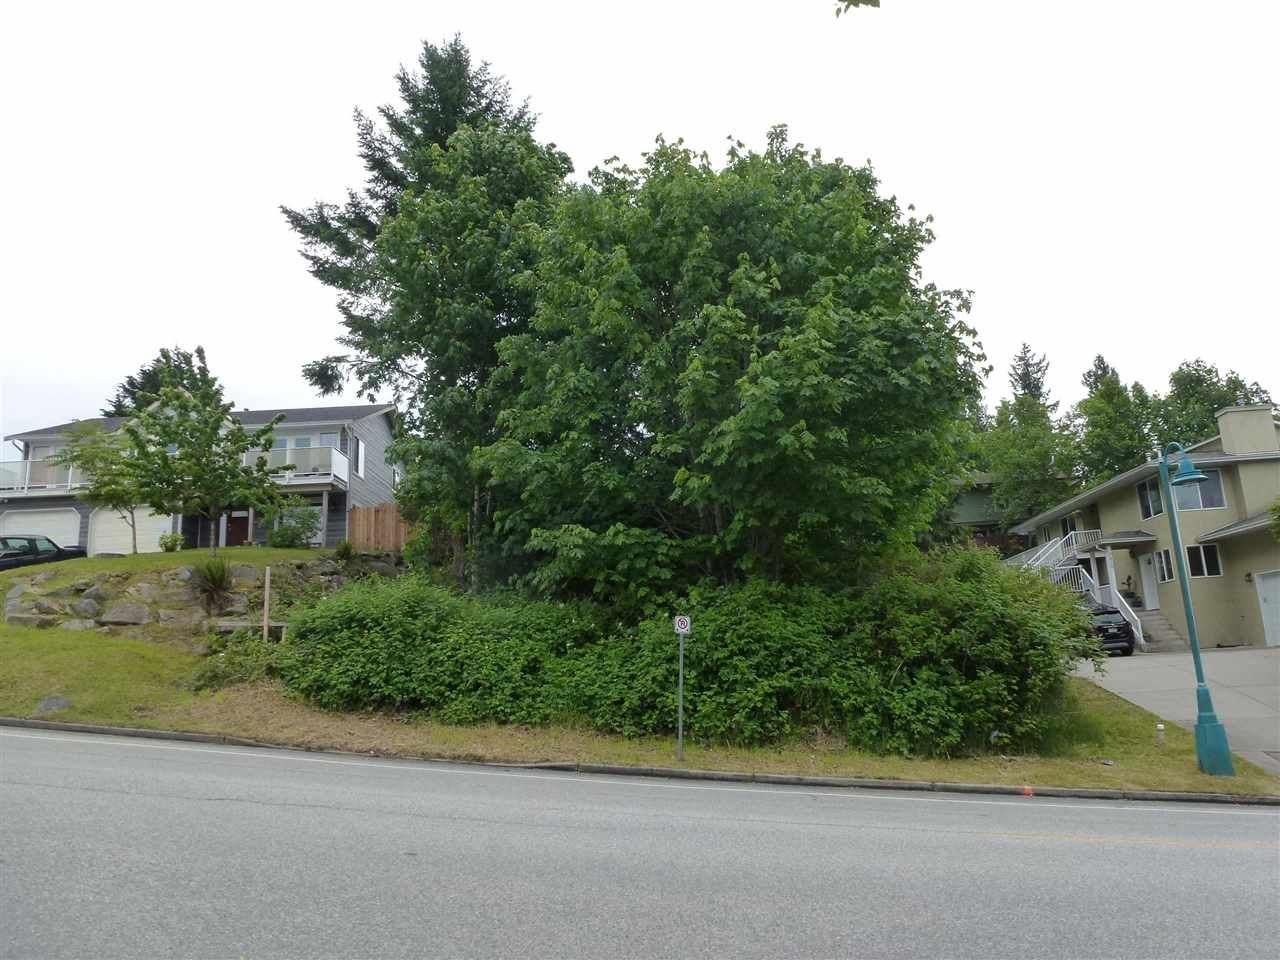 Main Photo: 111 TRAIL Avenue in Sechelt: Sechelt District Land for sale (Sunshine Coast)  : MLS®# R2586662